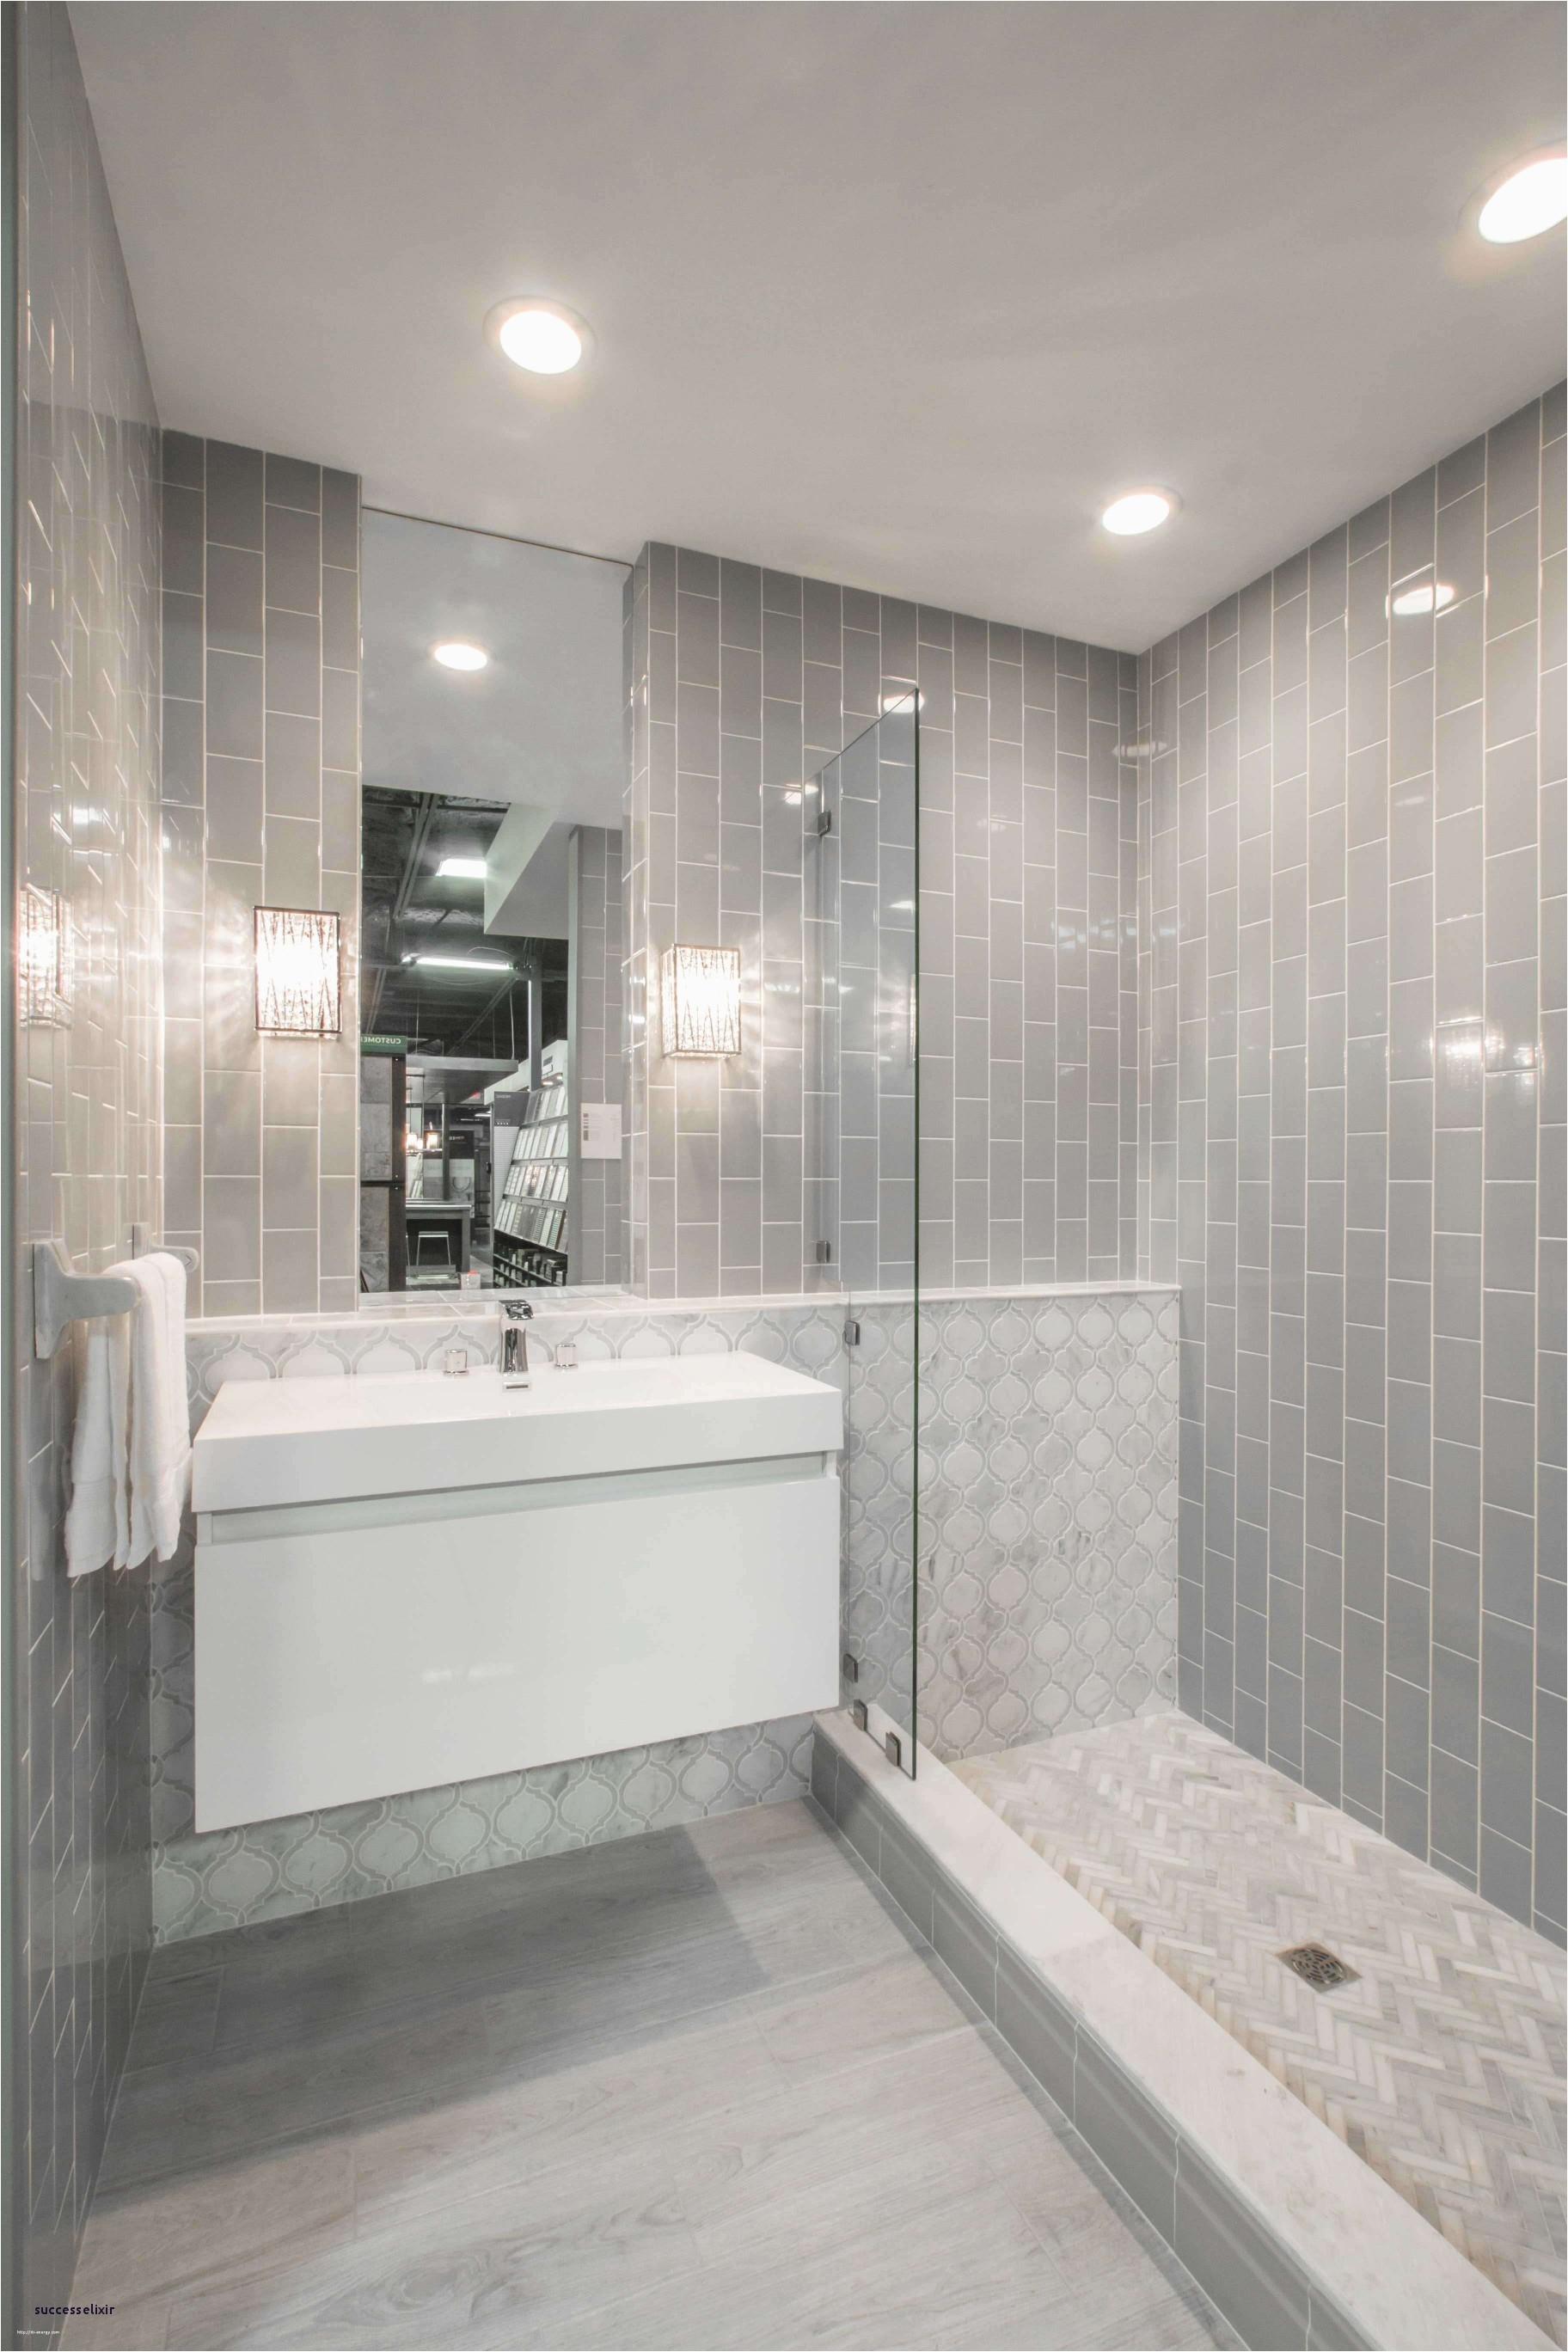 Modern Bathroom Remodel Unique White Bathroom Designs Fresh Grey Bathroom 0d Archives Modern House 20 Beautiful Stylish Bathroom Ideas Image from glass tile